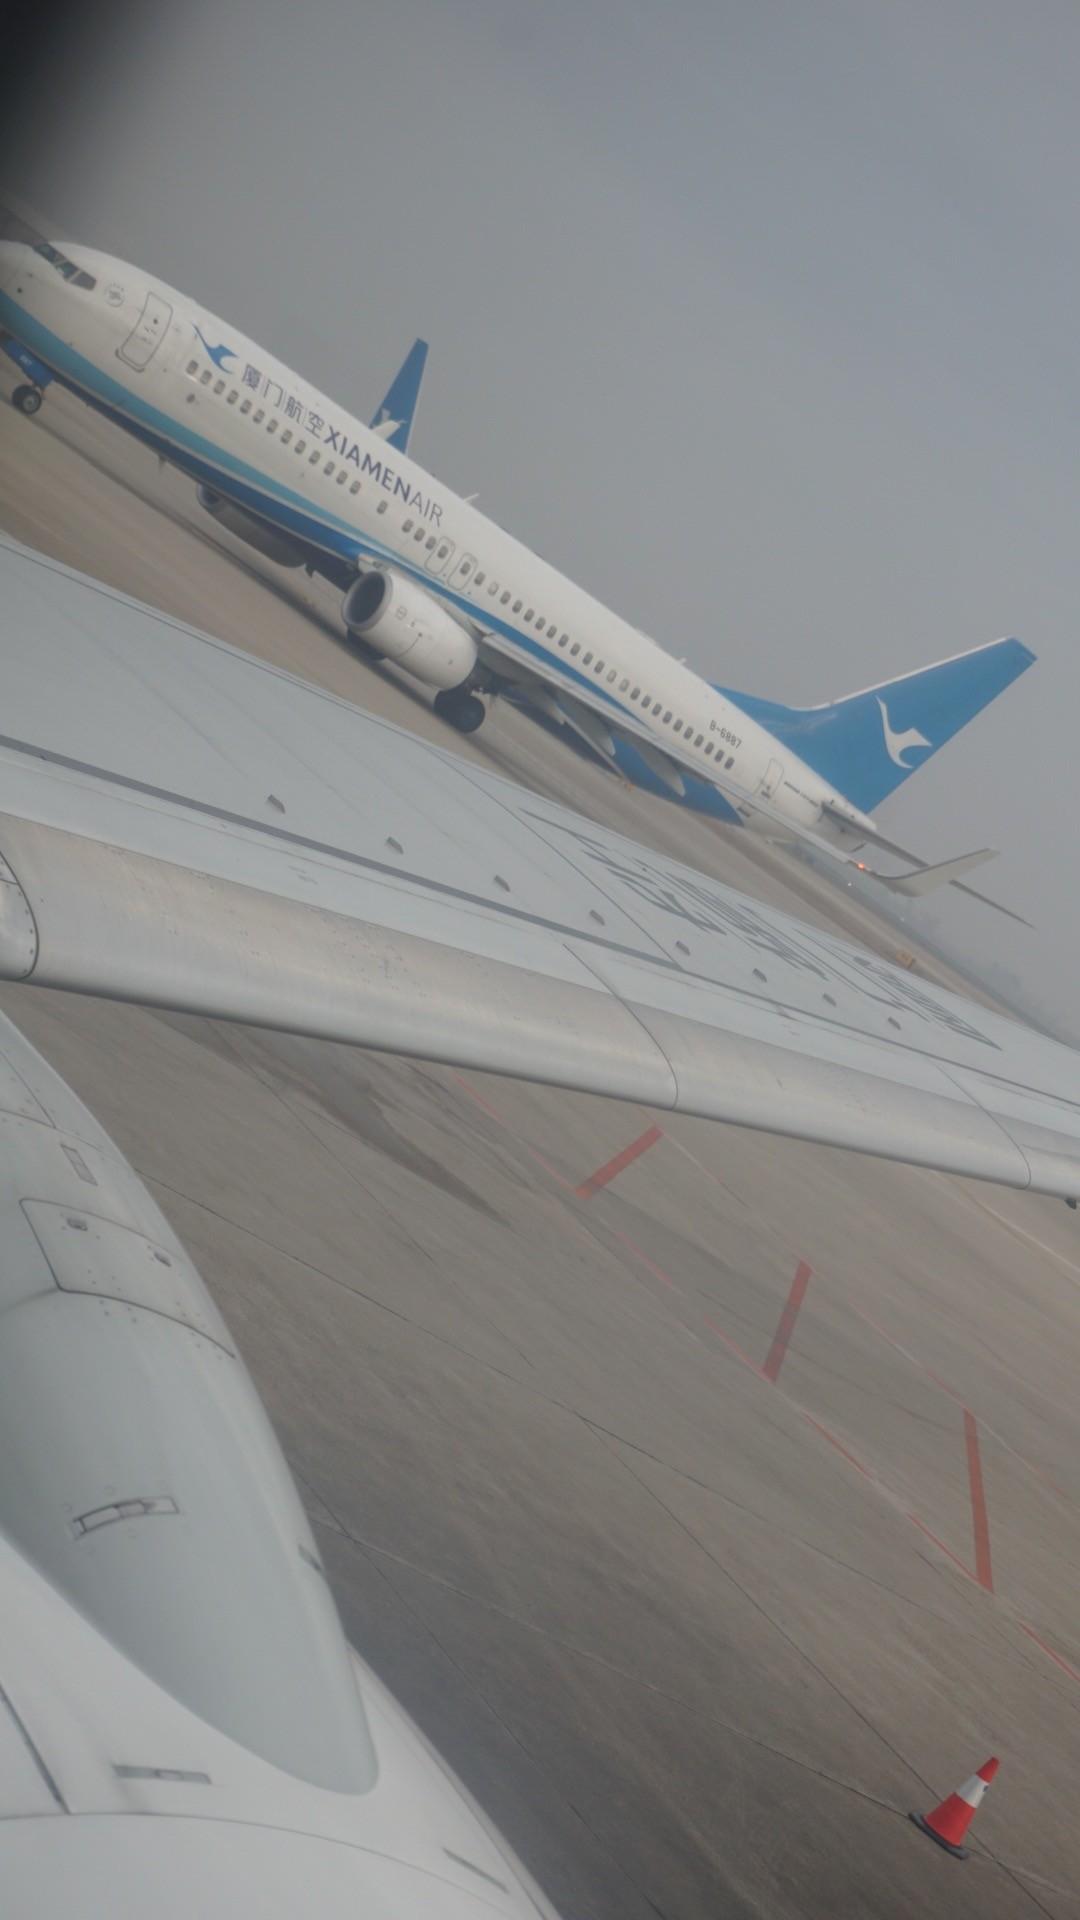 Re:[原创]新年第一次出行~…XMN-NGB-CGO 沿途拍机..多图 BOEING 737-800 B-6887 中国厦门高崎国际机场